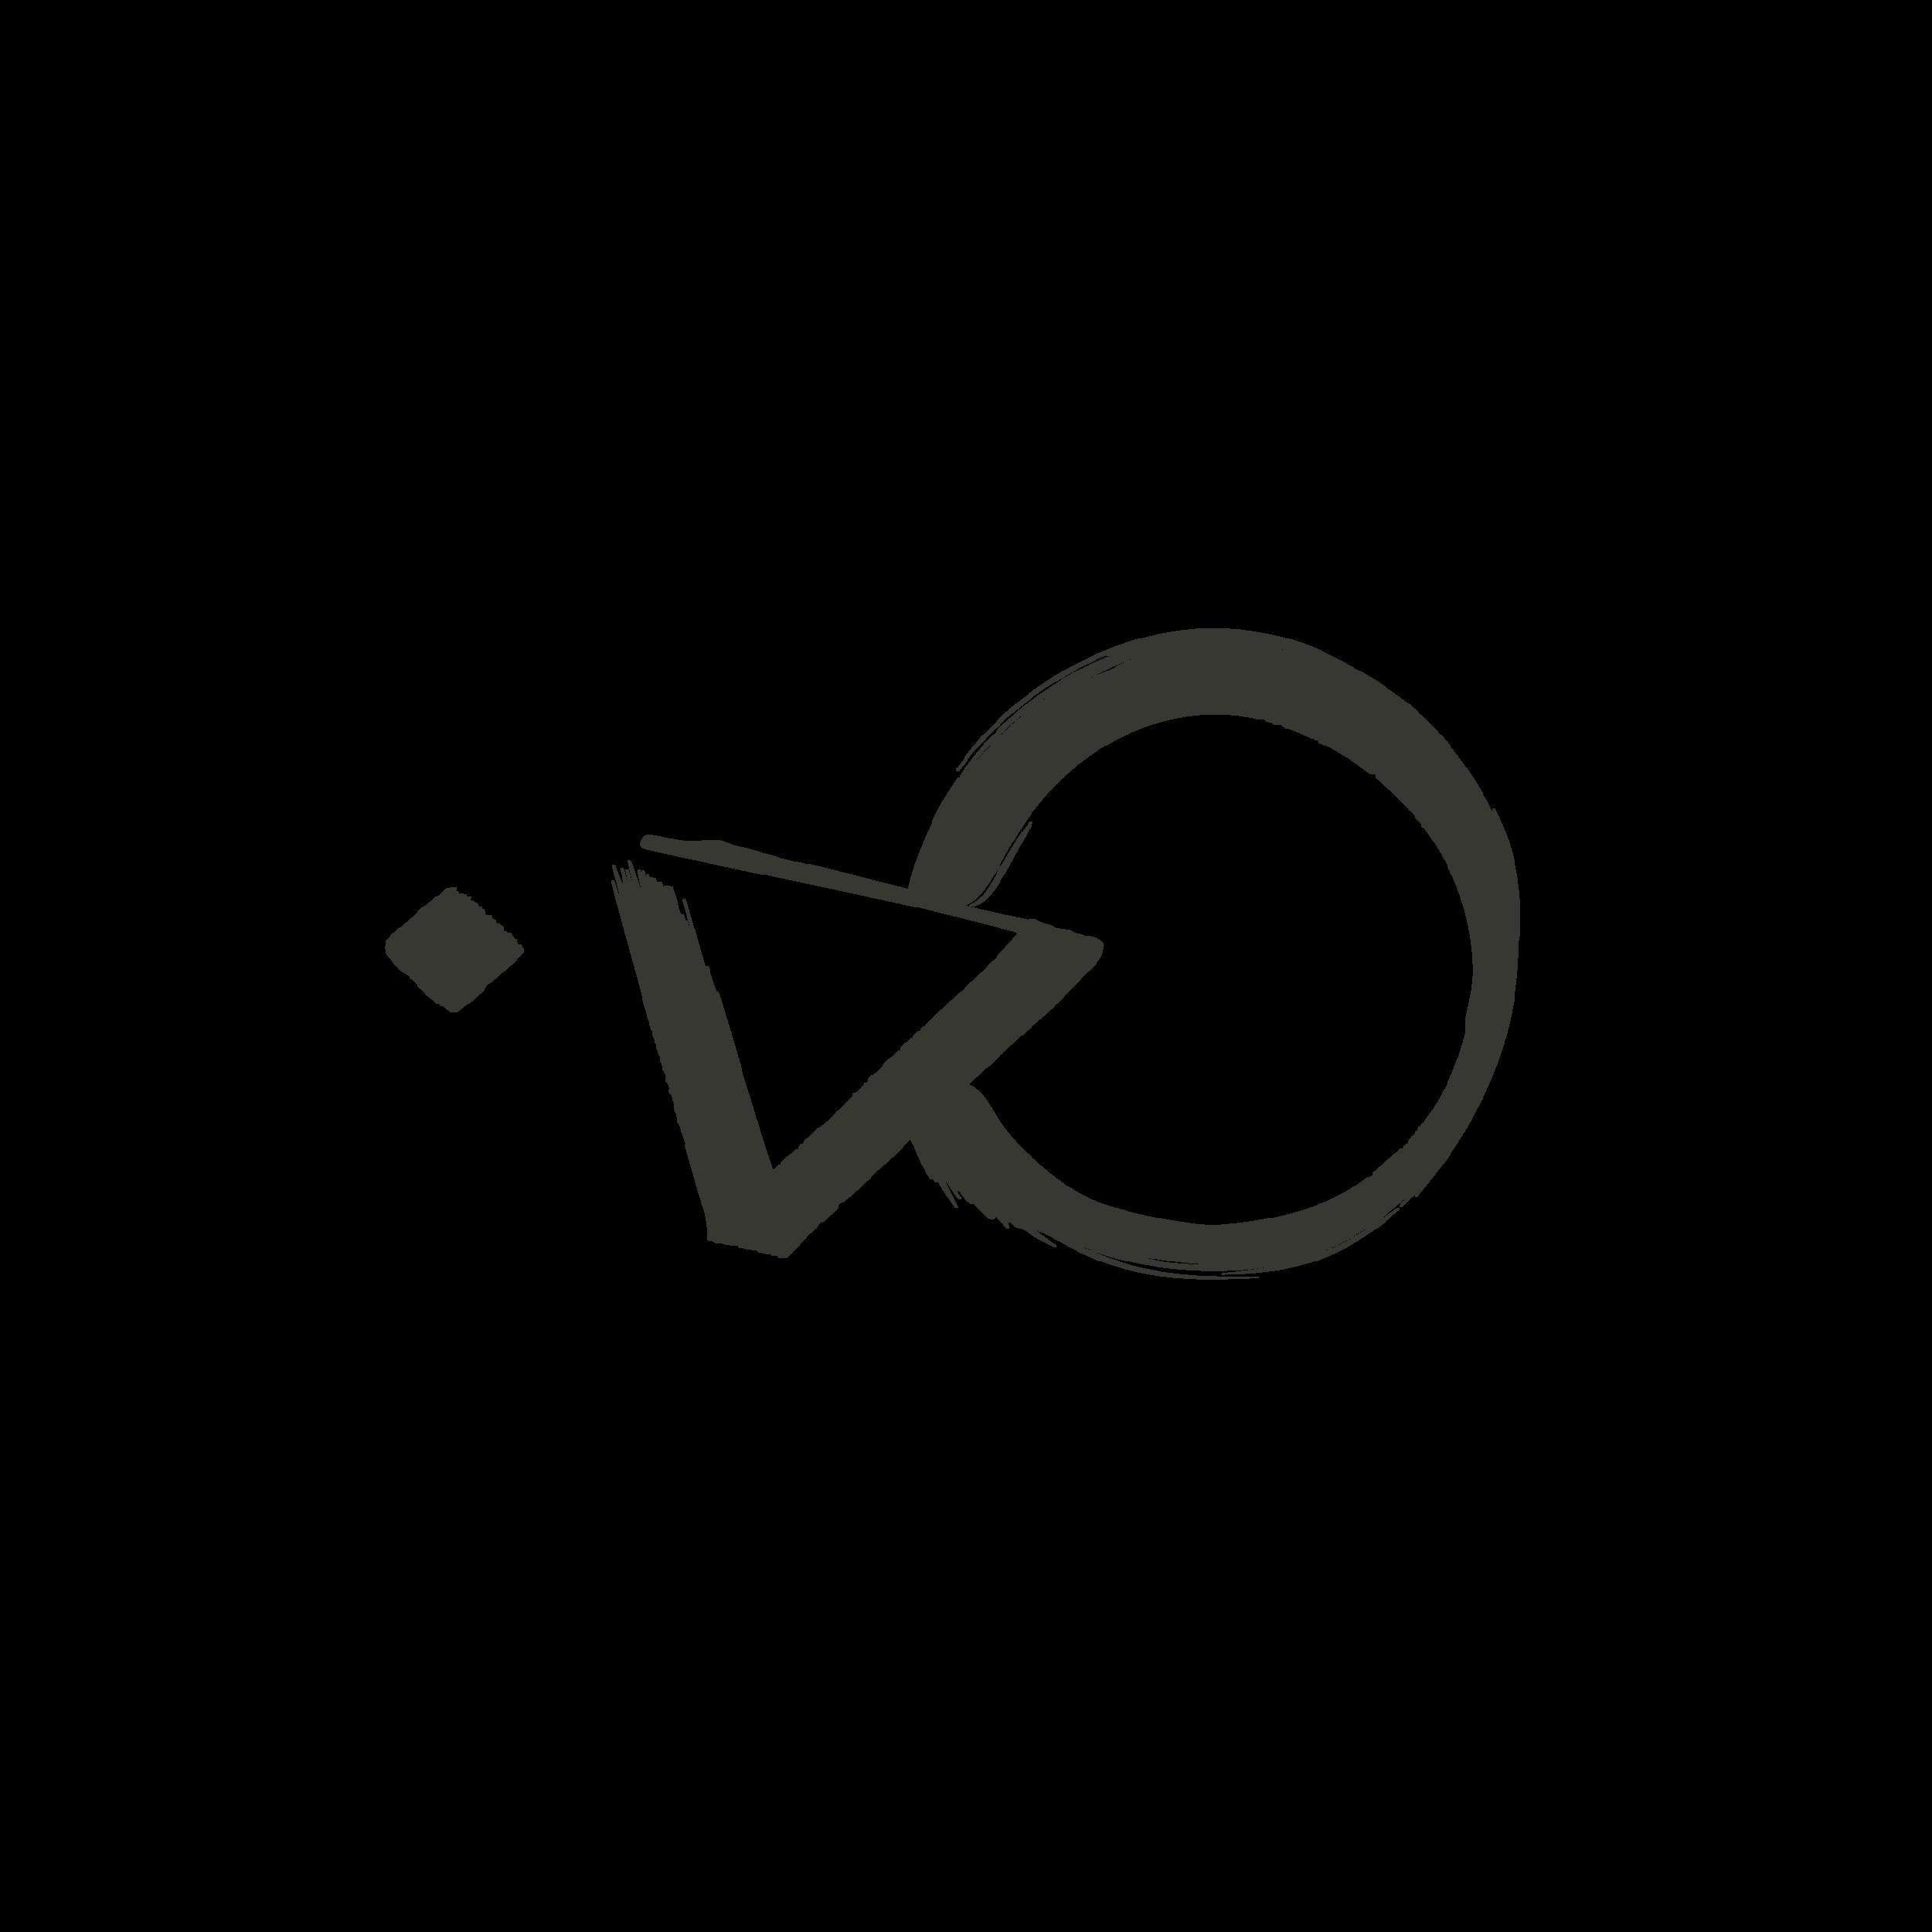 OfLeisure-symbol@2x.png